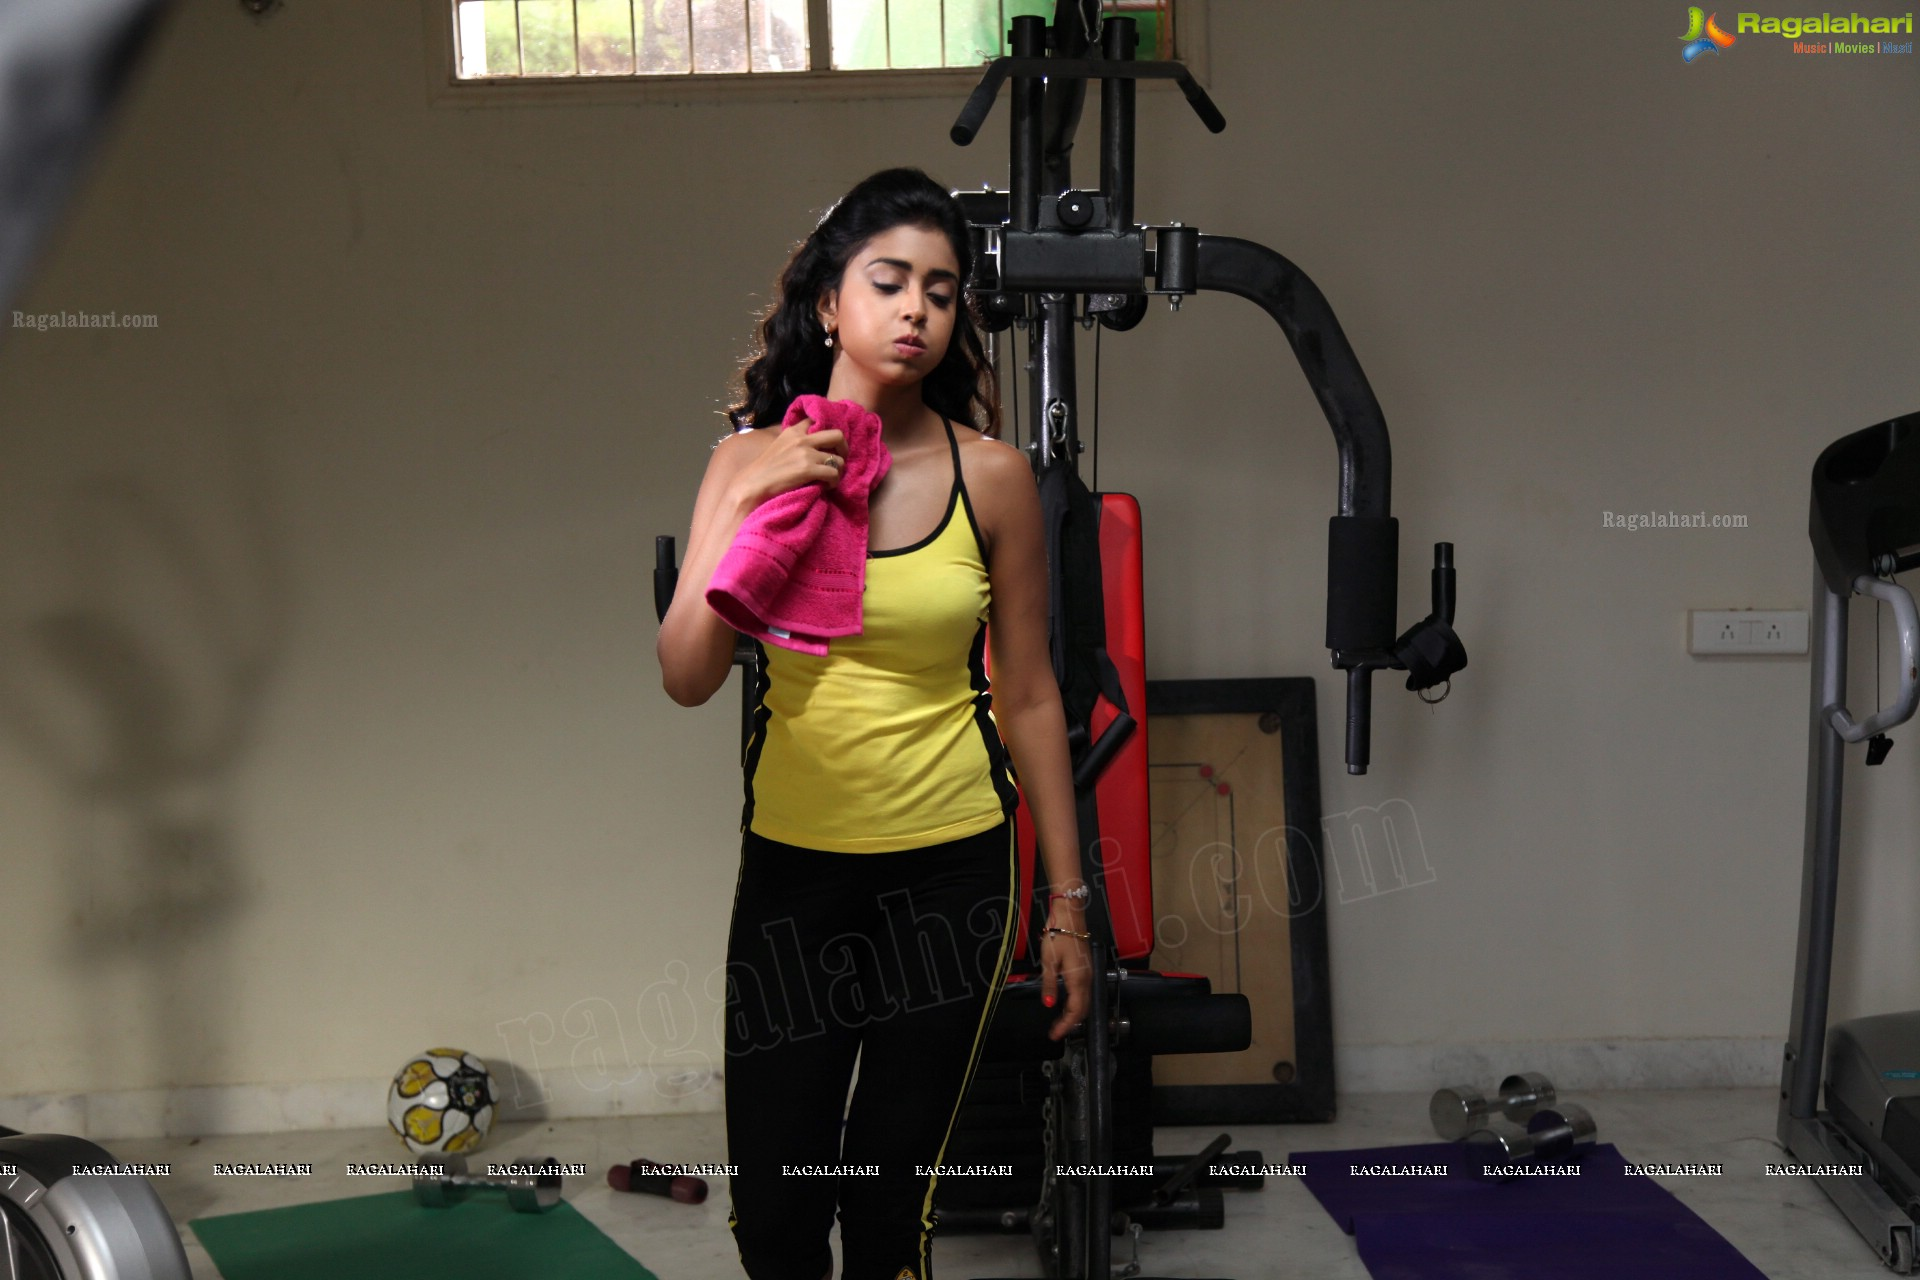 Shriya Saran Gym: THE ARMPITS OF SHRIYA SARAN IN ULTRA HD